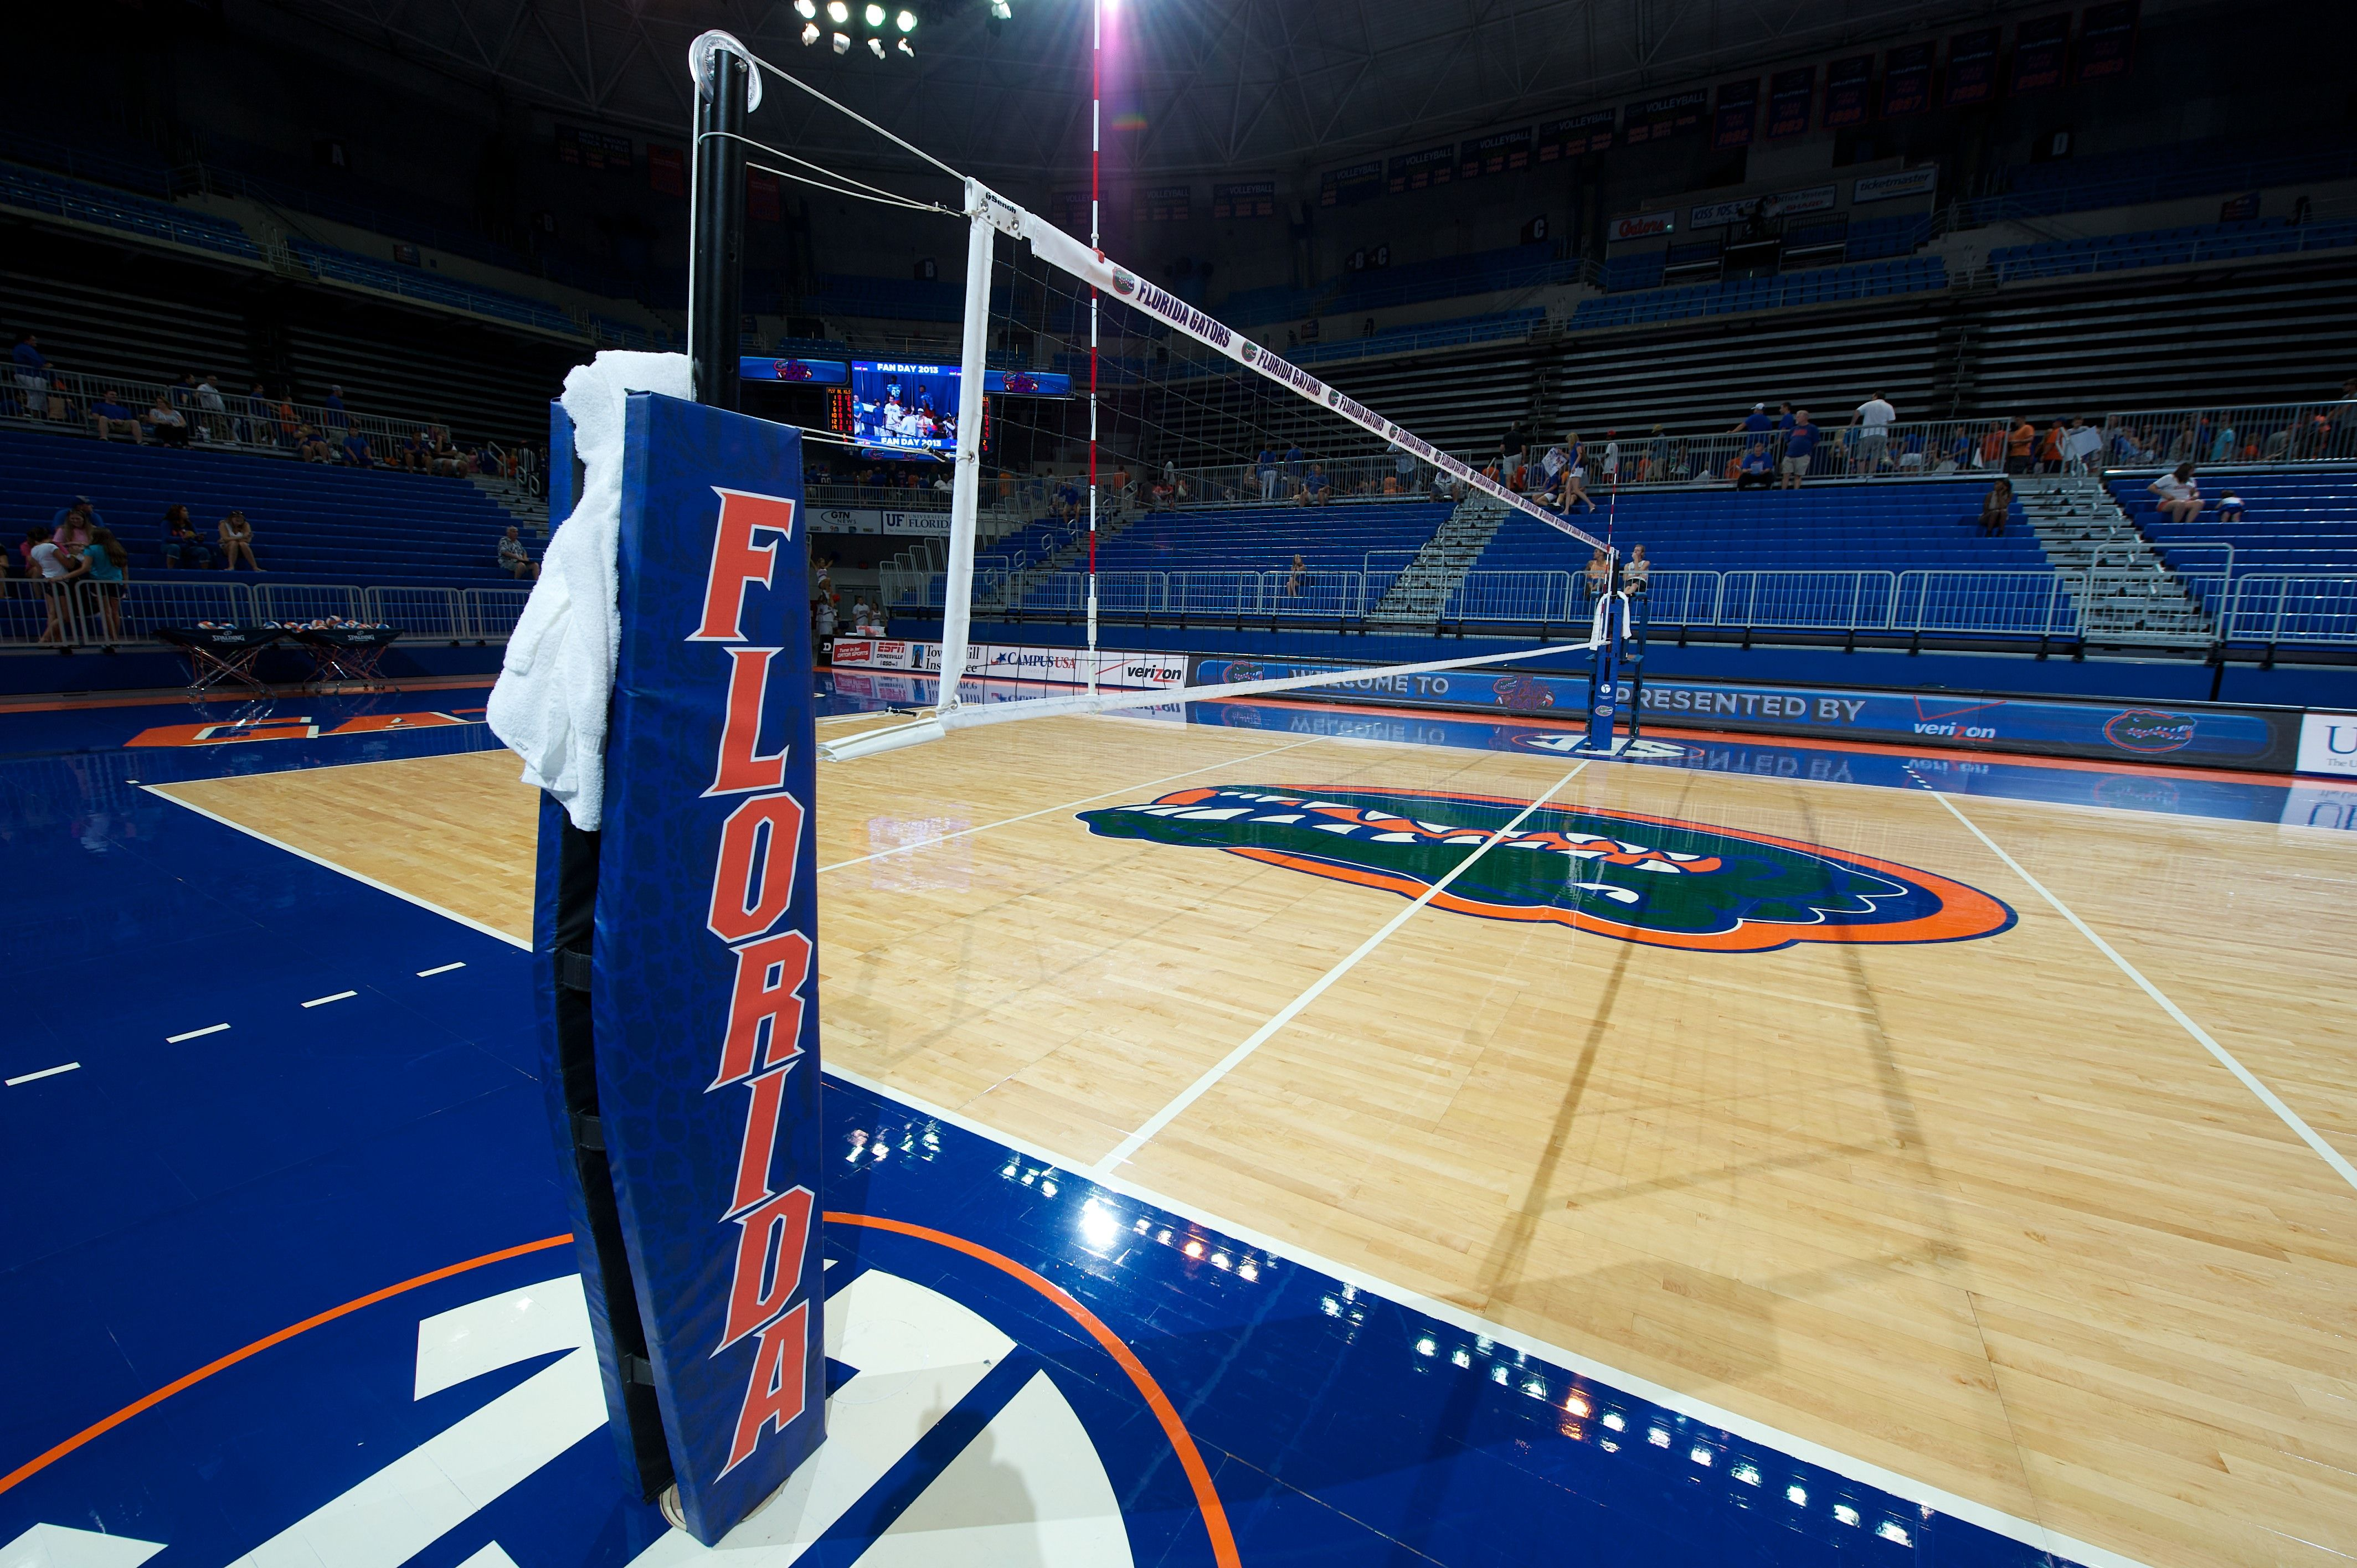 University Of Florida Carbon Volleyball Net System Florida Volleyball Volleyball Net Outdoor Volleyball Net